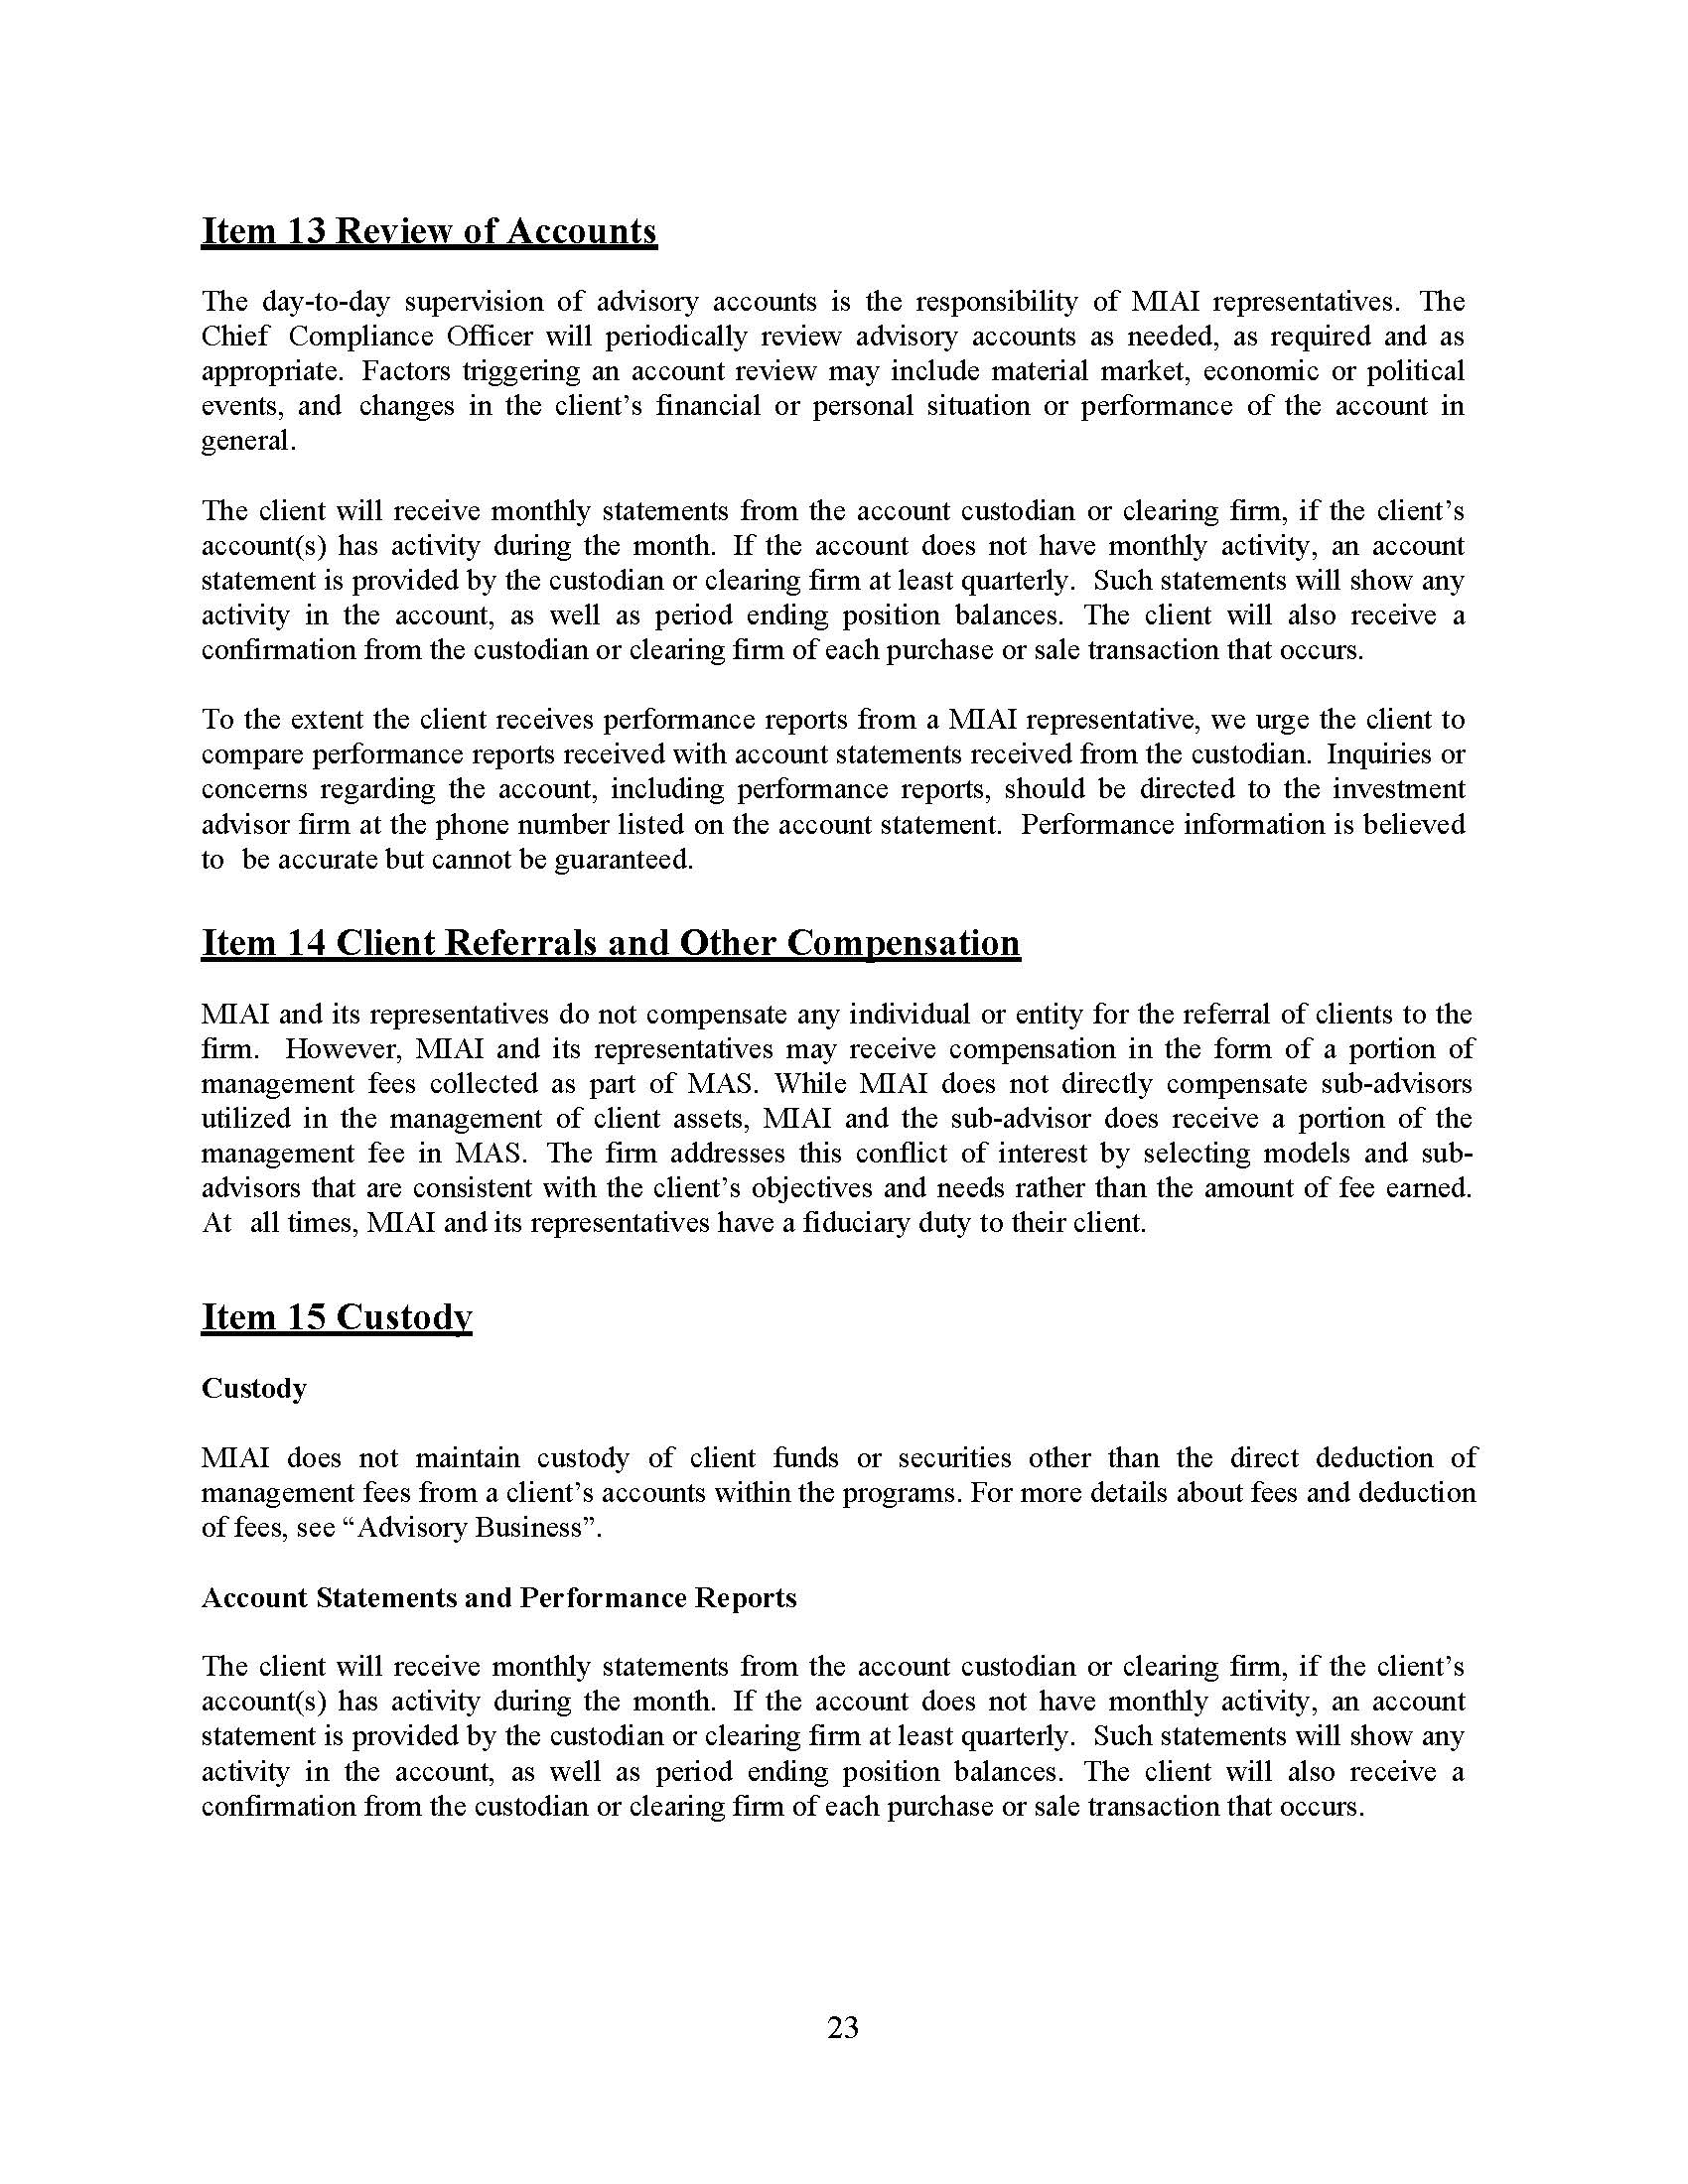 MIAI Brochure 10.1.17_Page_23.jpg